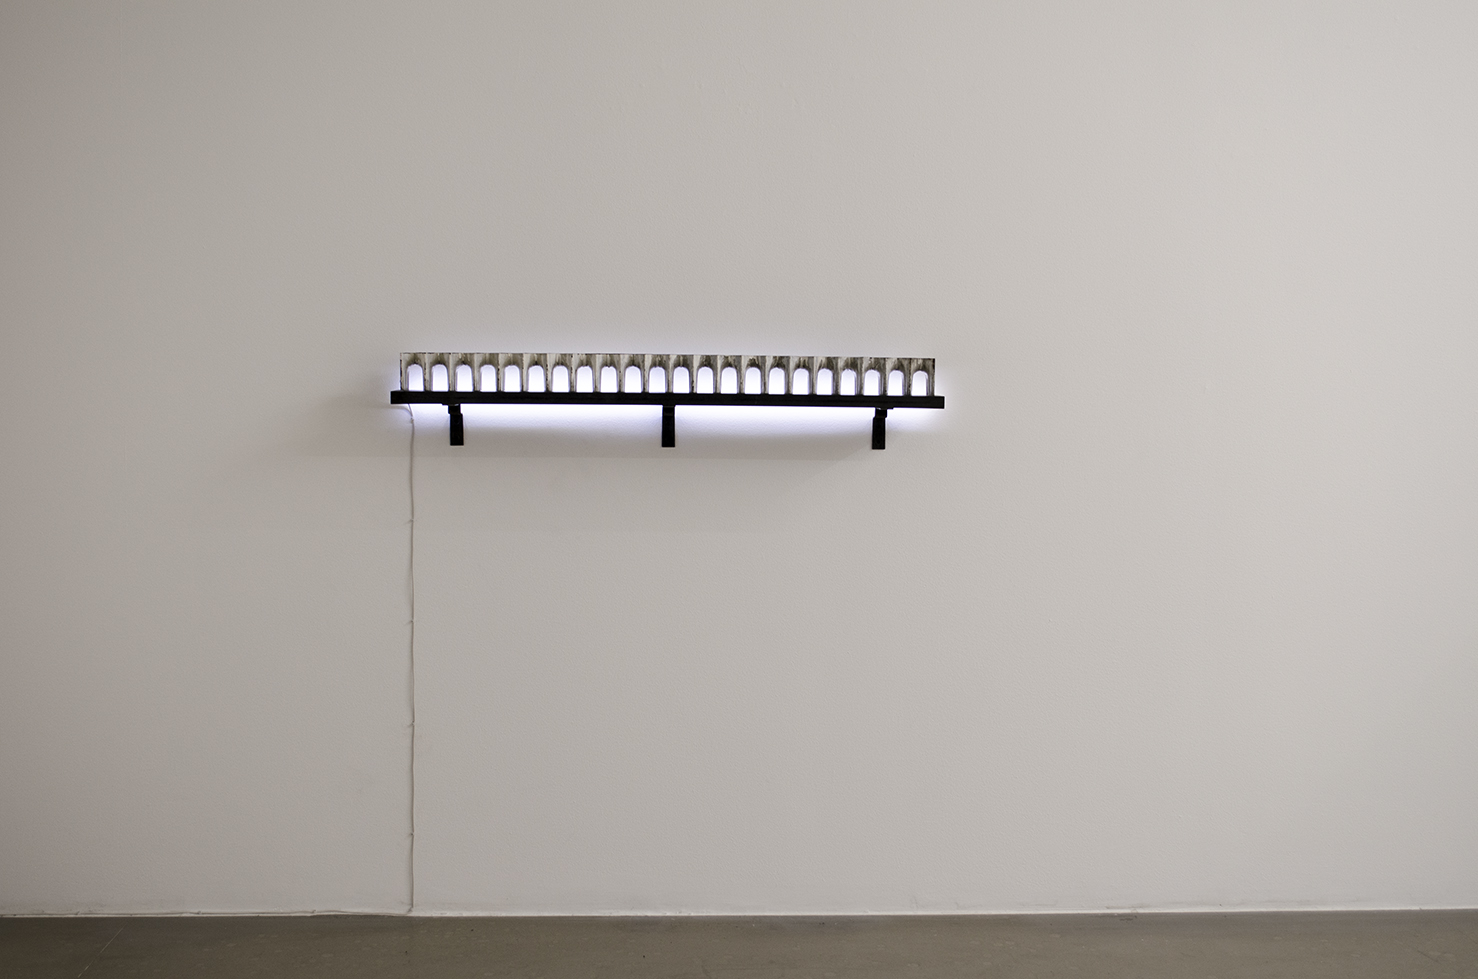 Length 1,03 meter - parts of radiator; iron, valchromat, led-light